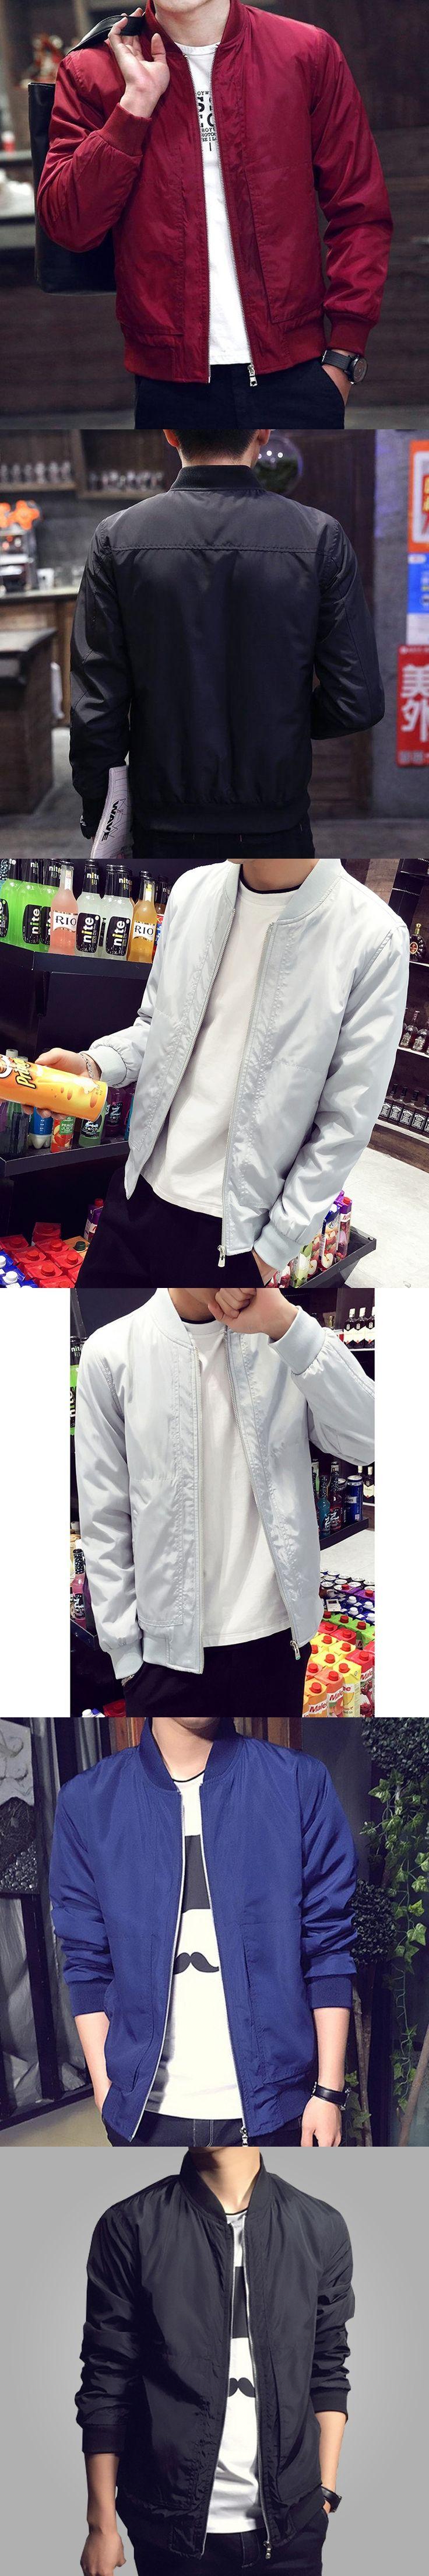 2017 Fashion High Street Men Clothes Clothing Mens Jackets Multi Colors Jacket Man Waterproof Men Bomber Jacket